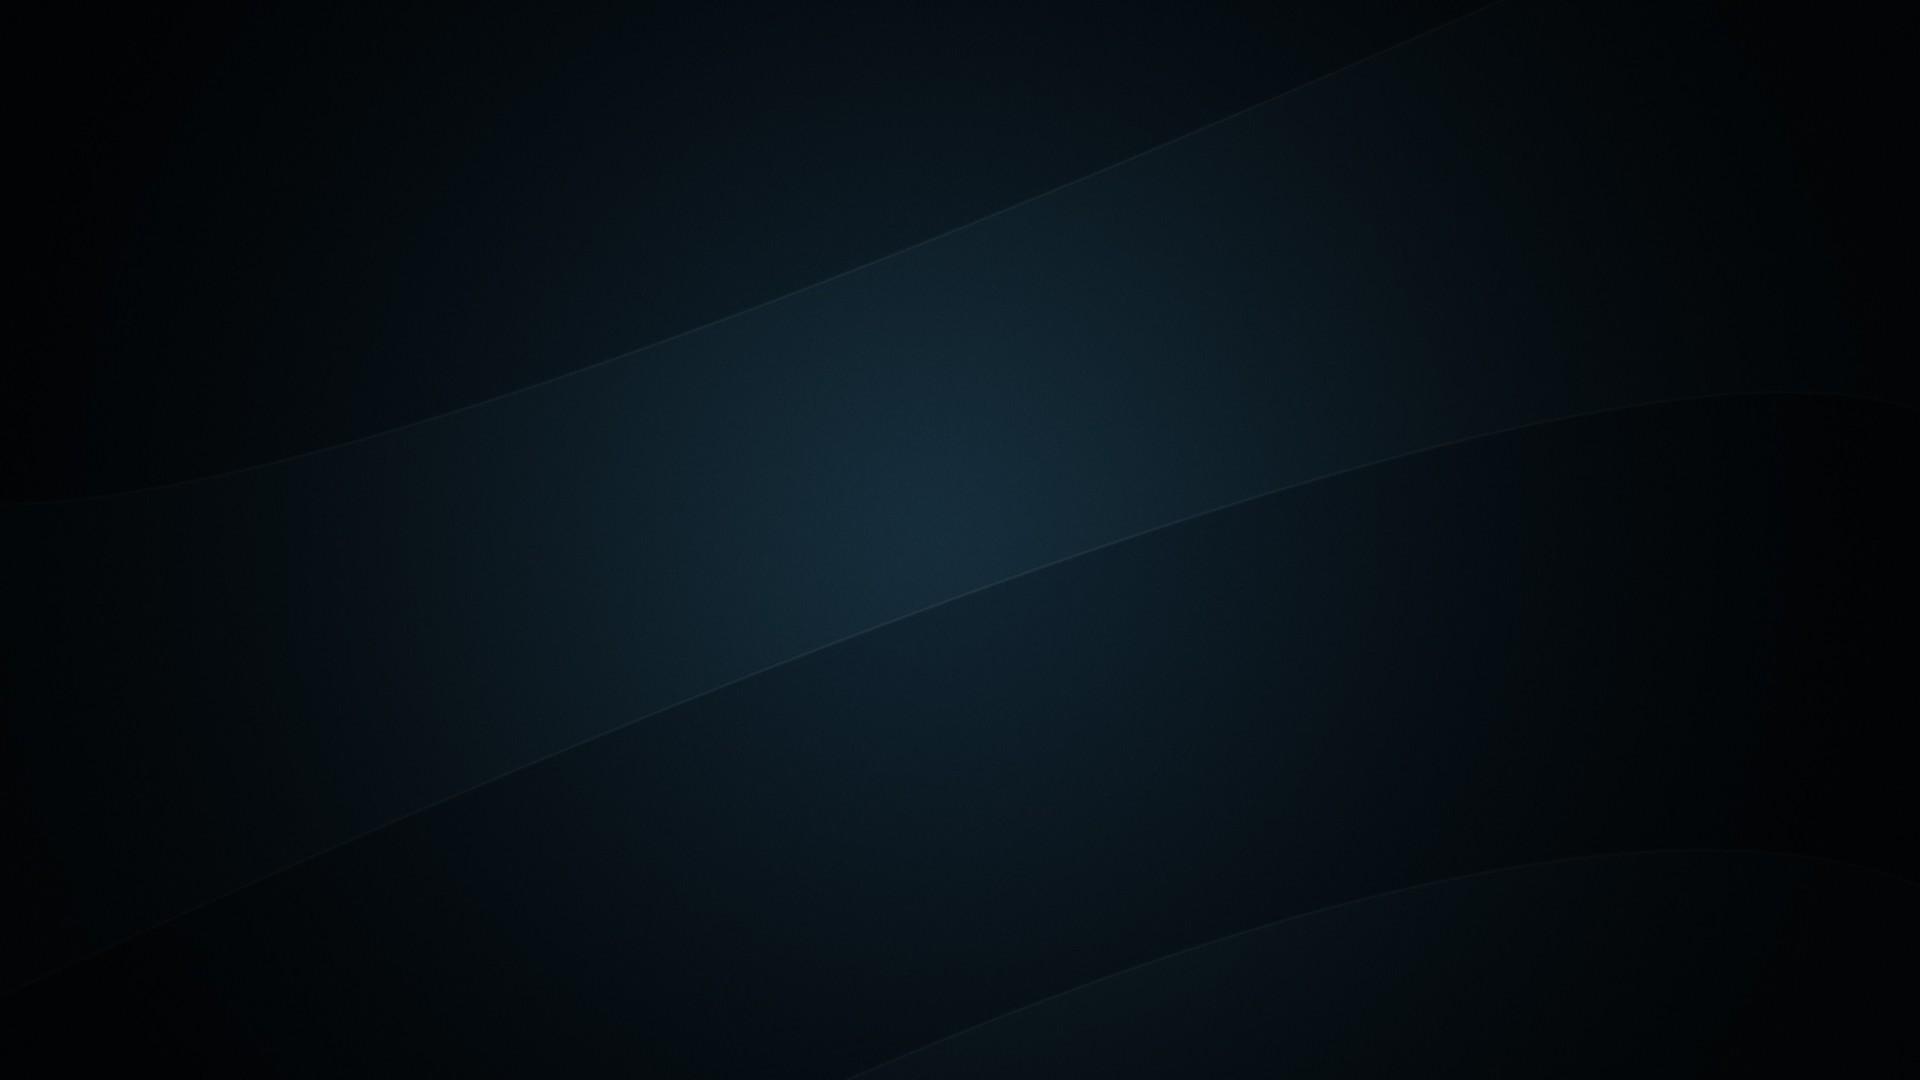 1920x1080 Dark Blue Wallpaper · Download · 1080x1920 black_iii_phone-1